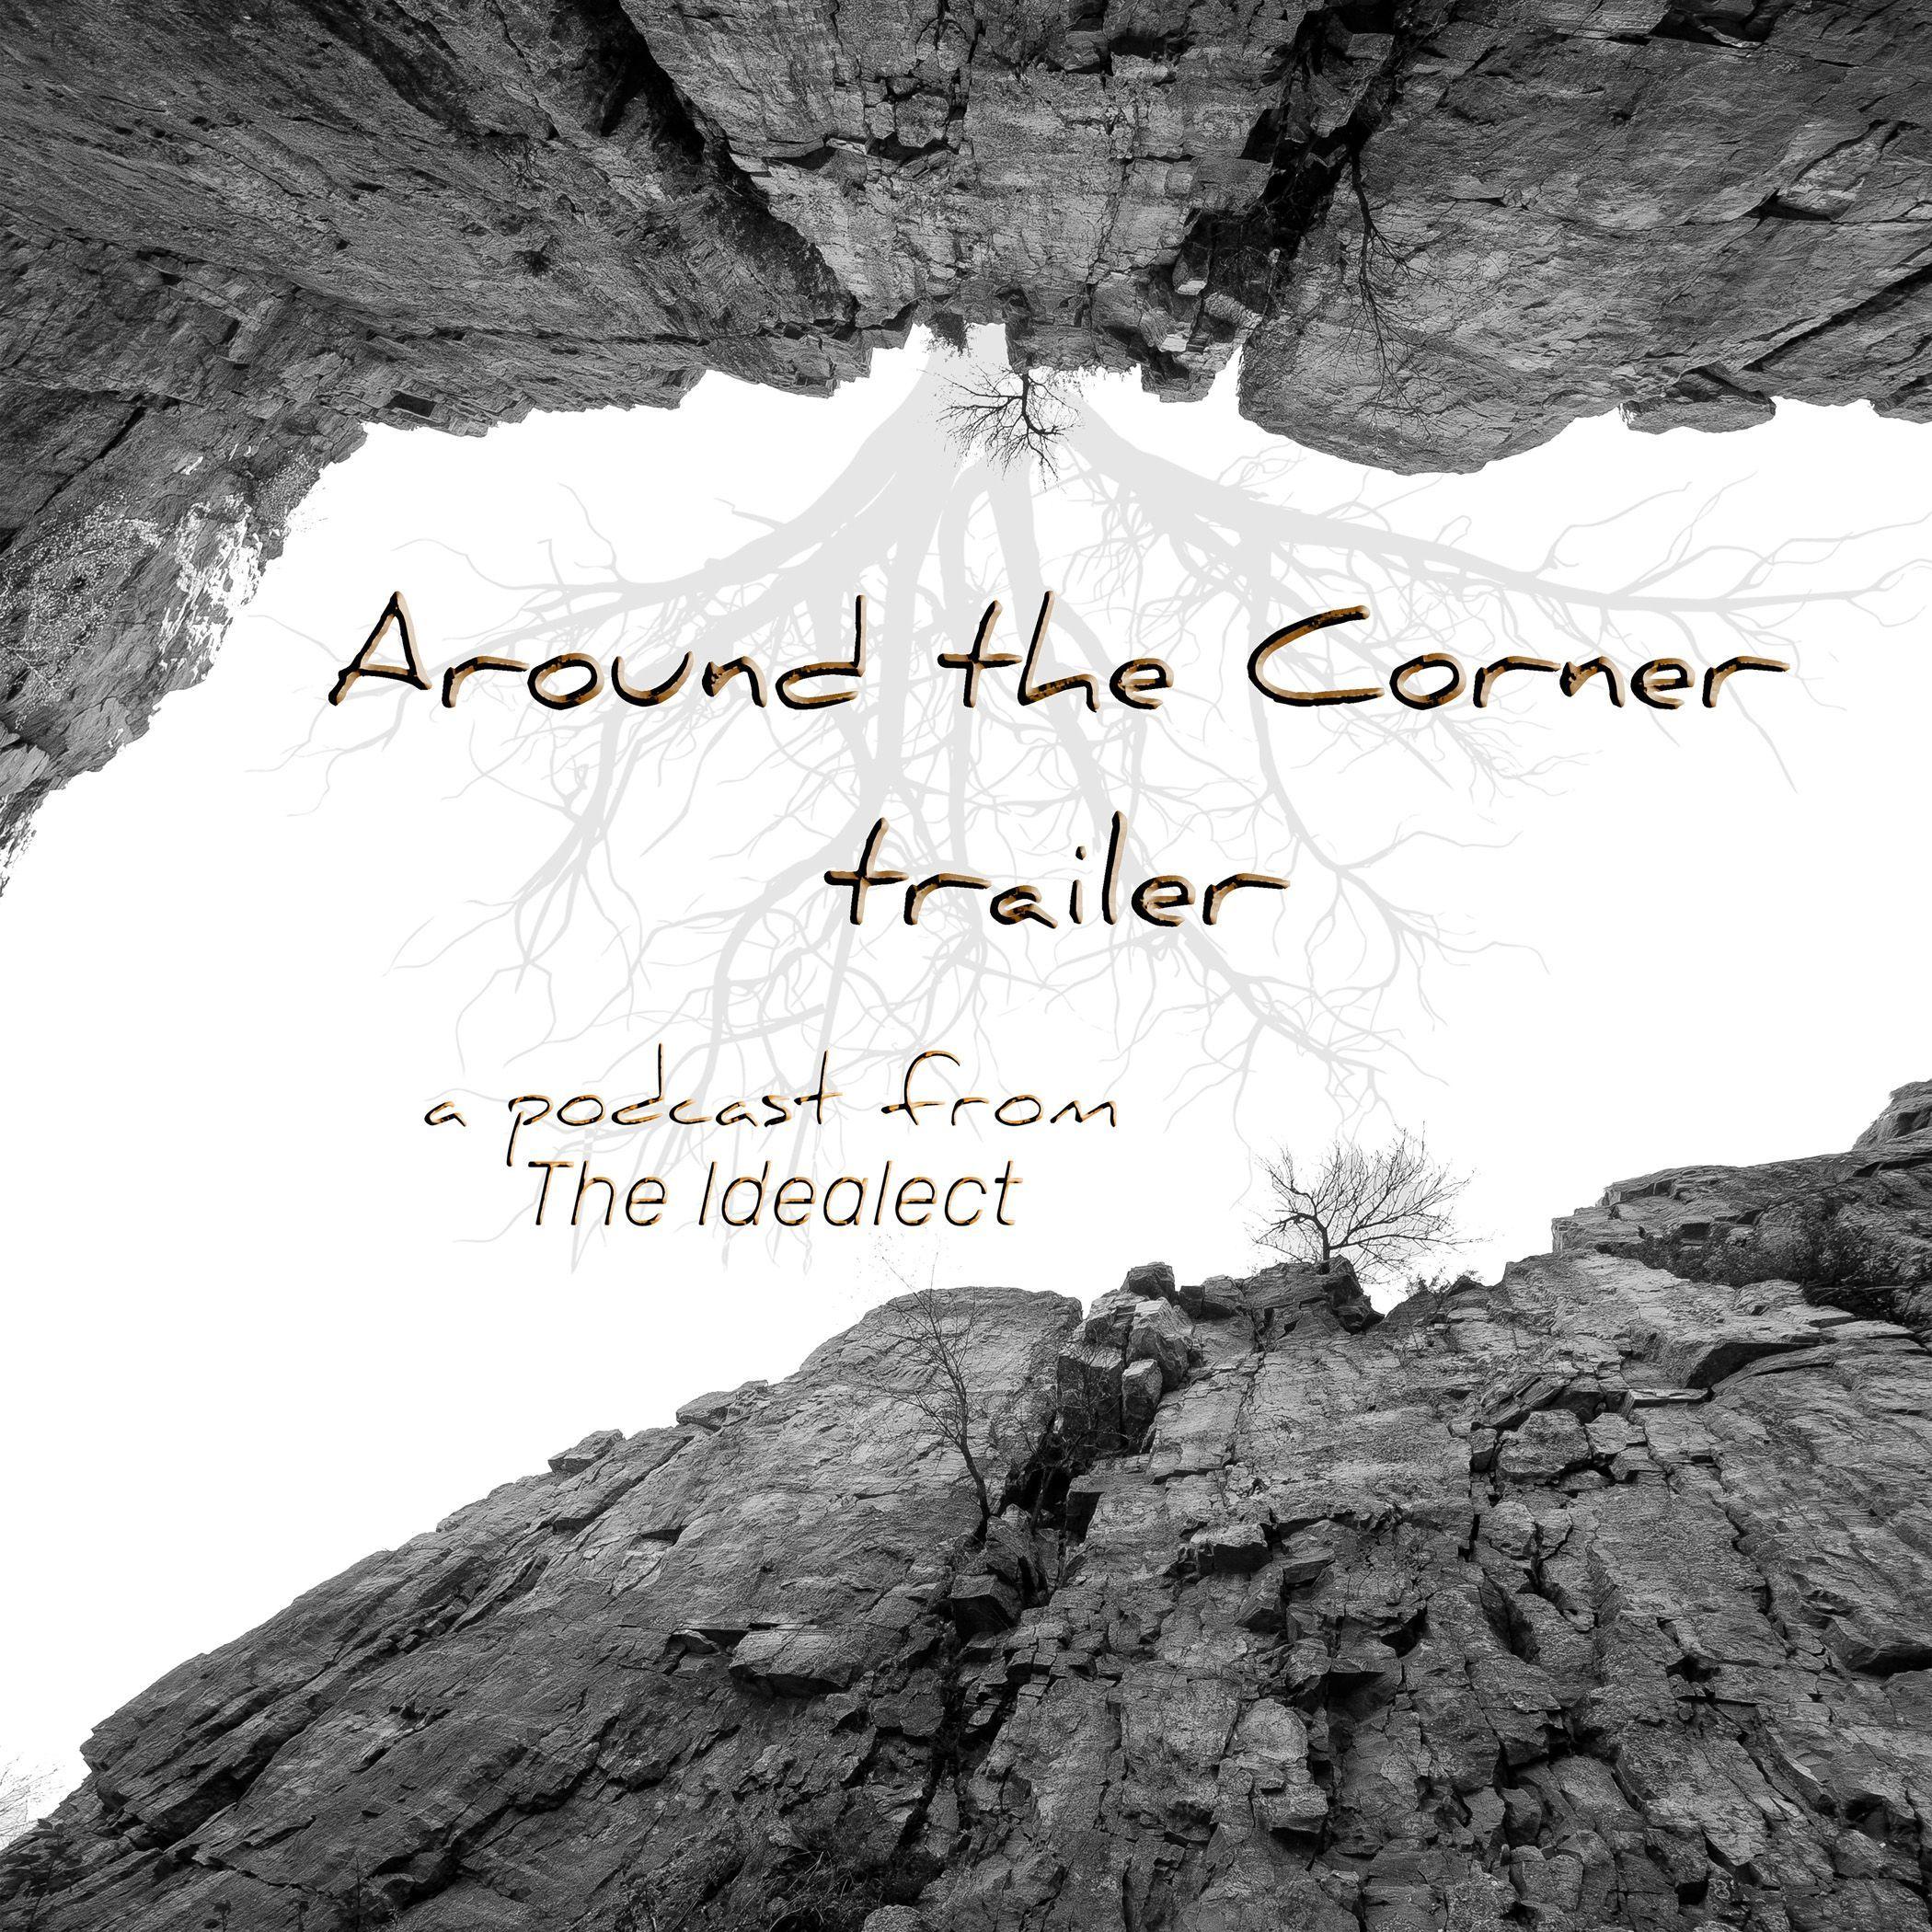 Around The Corner Trailer